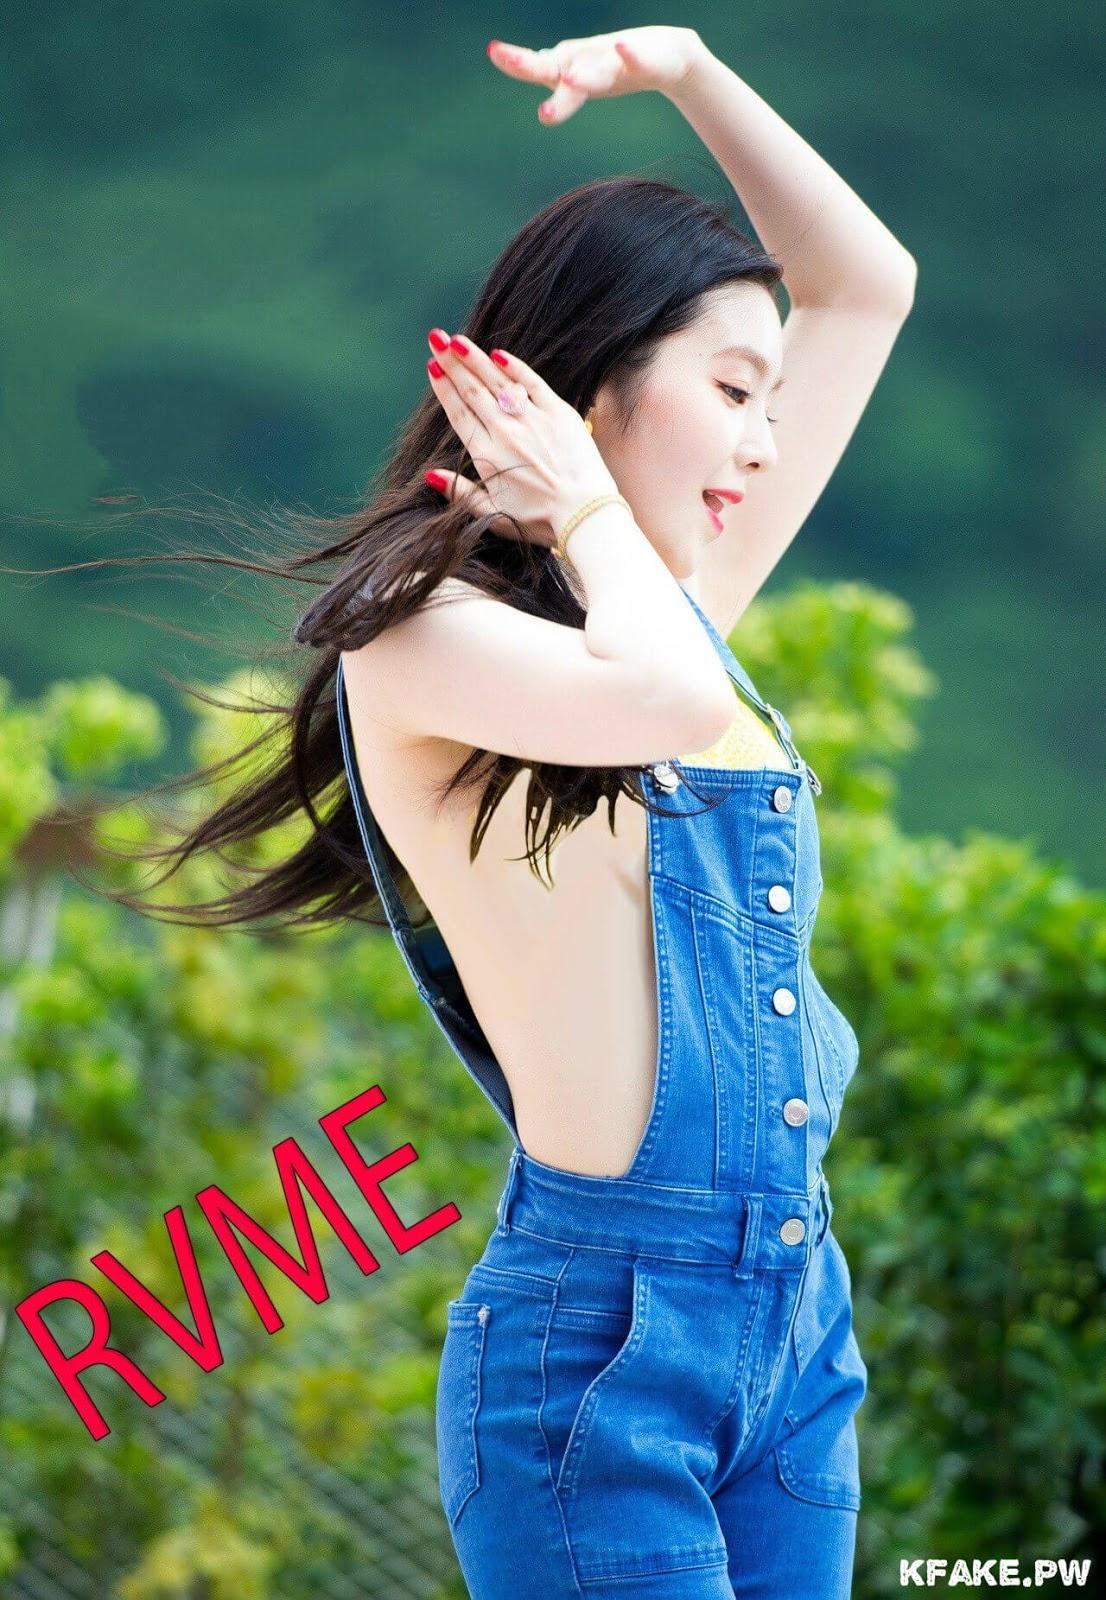 IU #back (Photoshop retouched fake) | Korean beauty girls